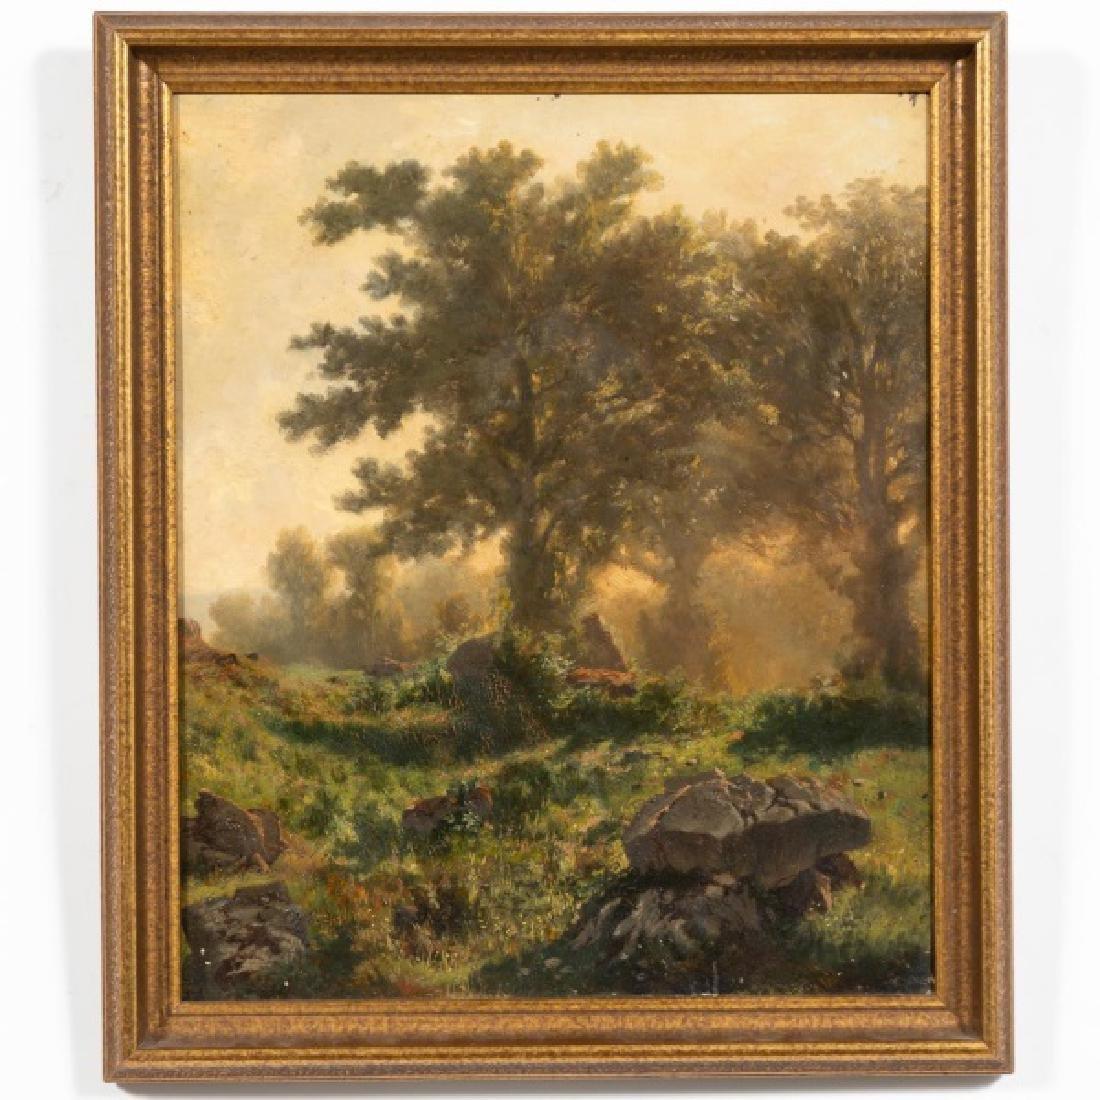 Signed French School O/C Landscape Scene, 1895